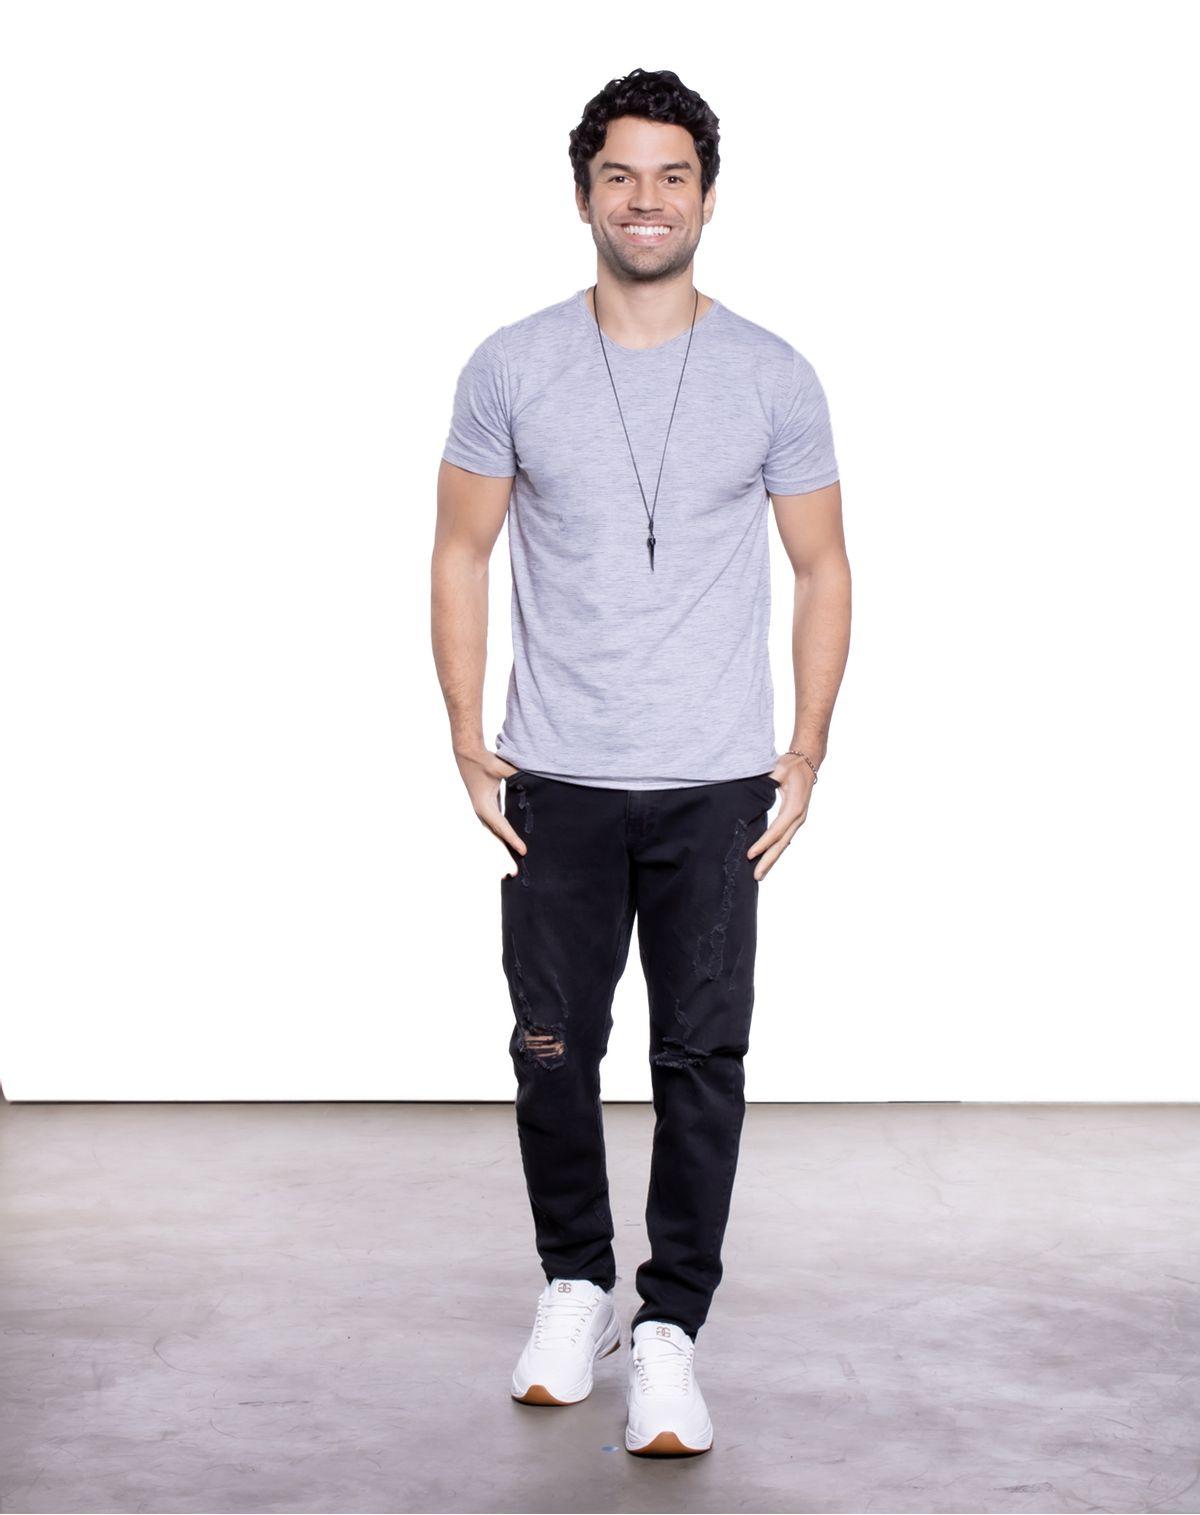 592667004-calca-jeans-black-masculina-skinny-destroyed-jeans-black-44-0a3